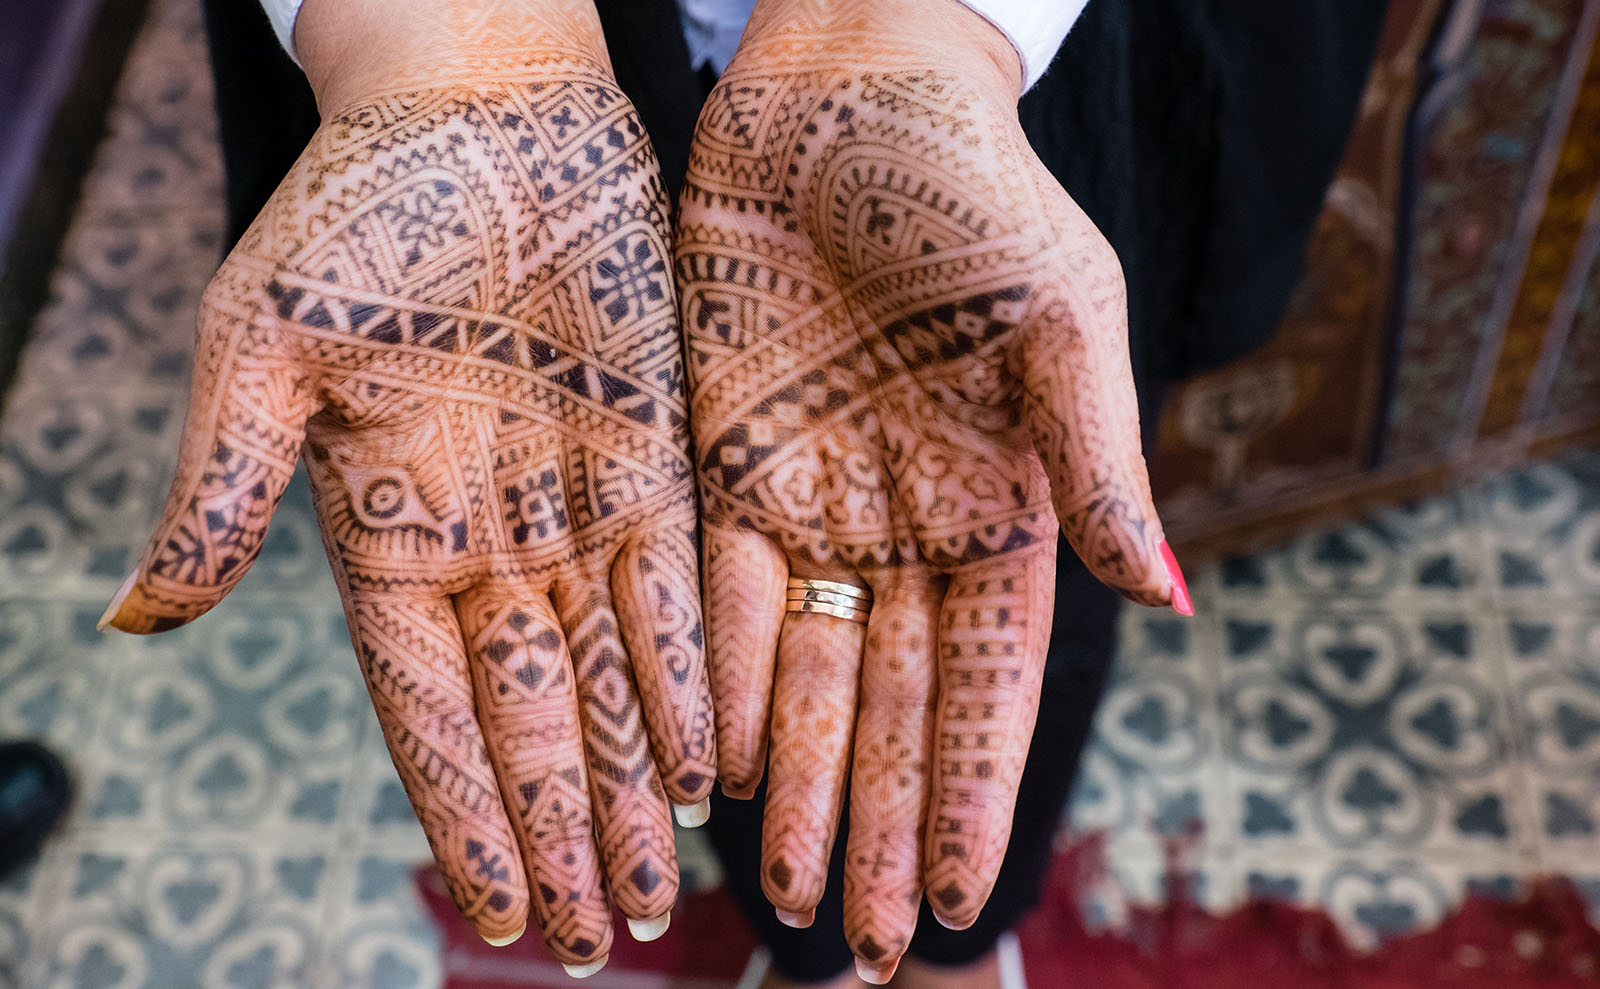 a woman's hands displaying dark henna tattoos